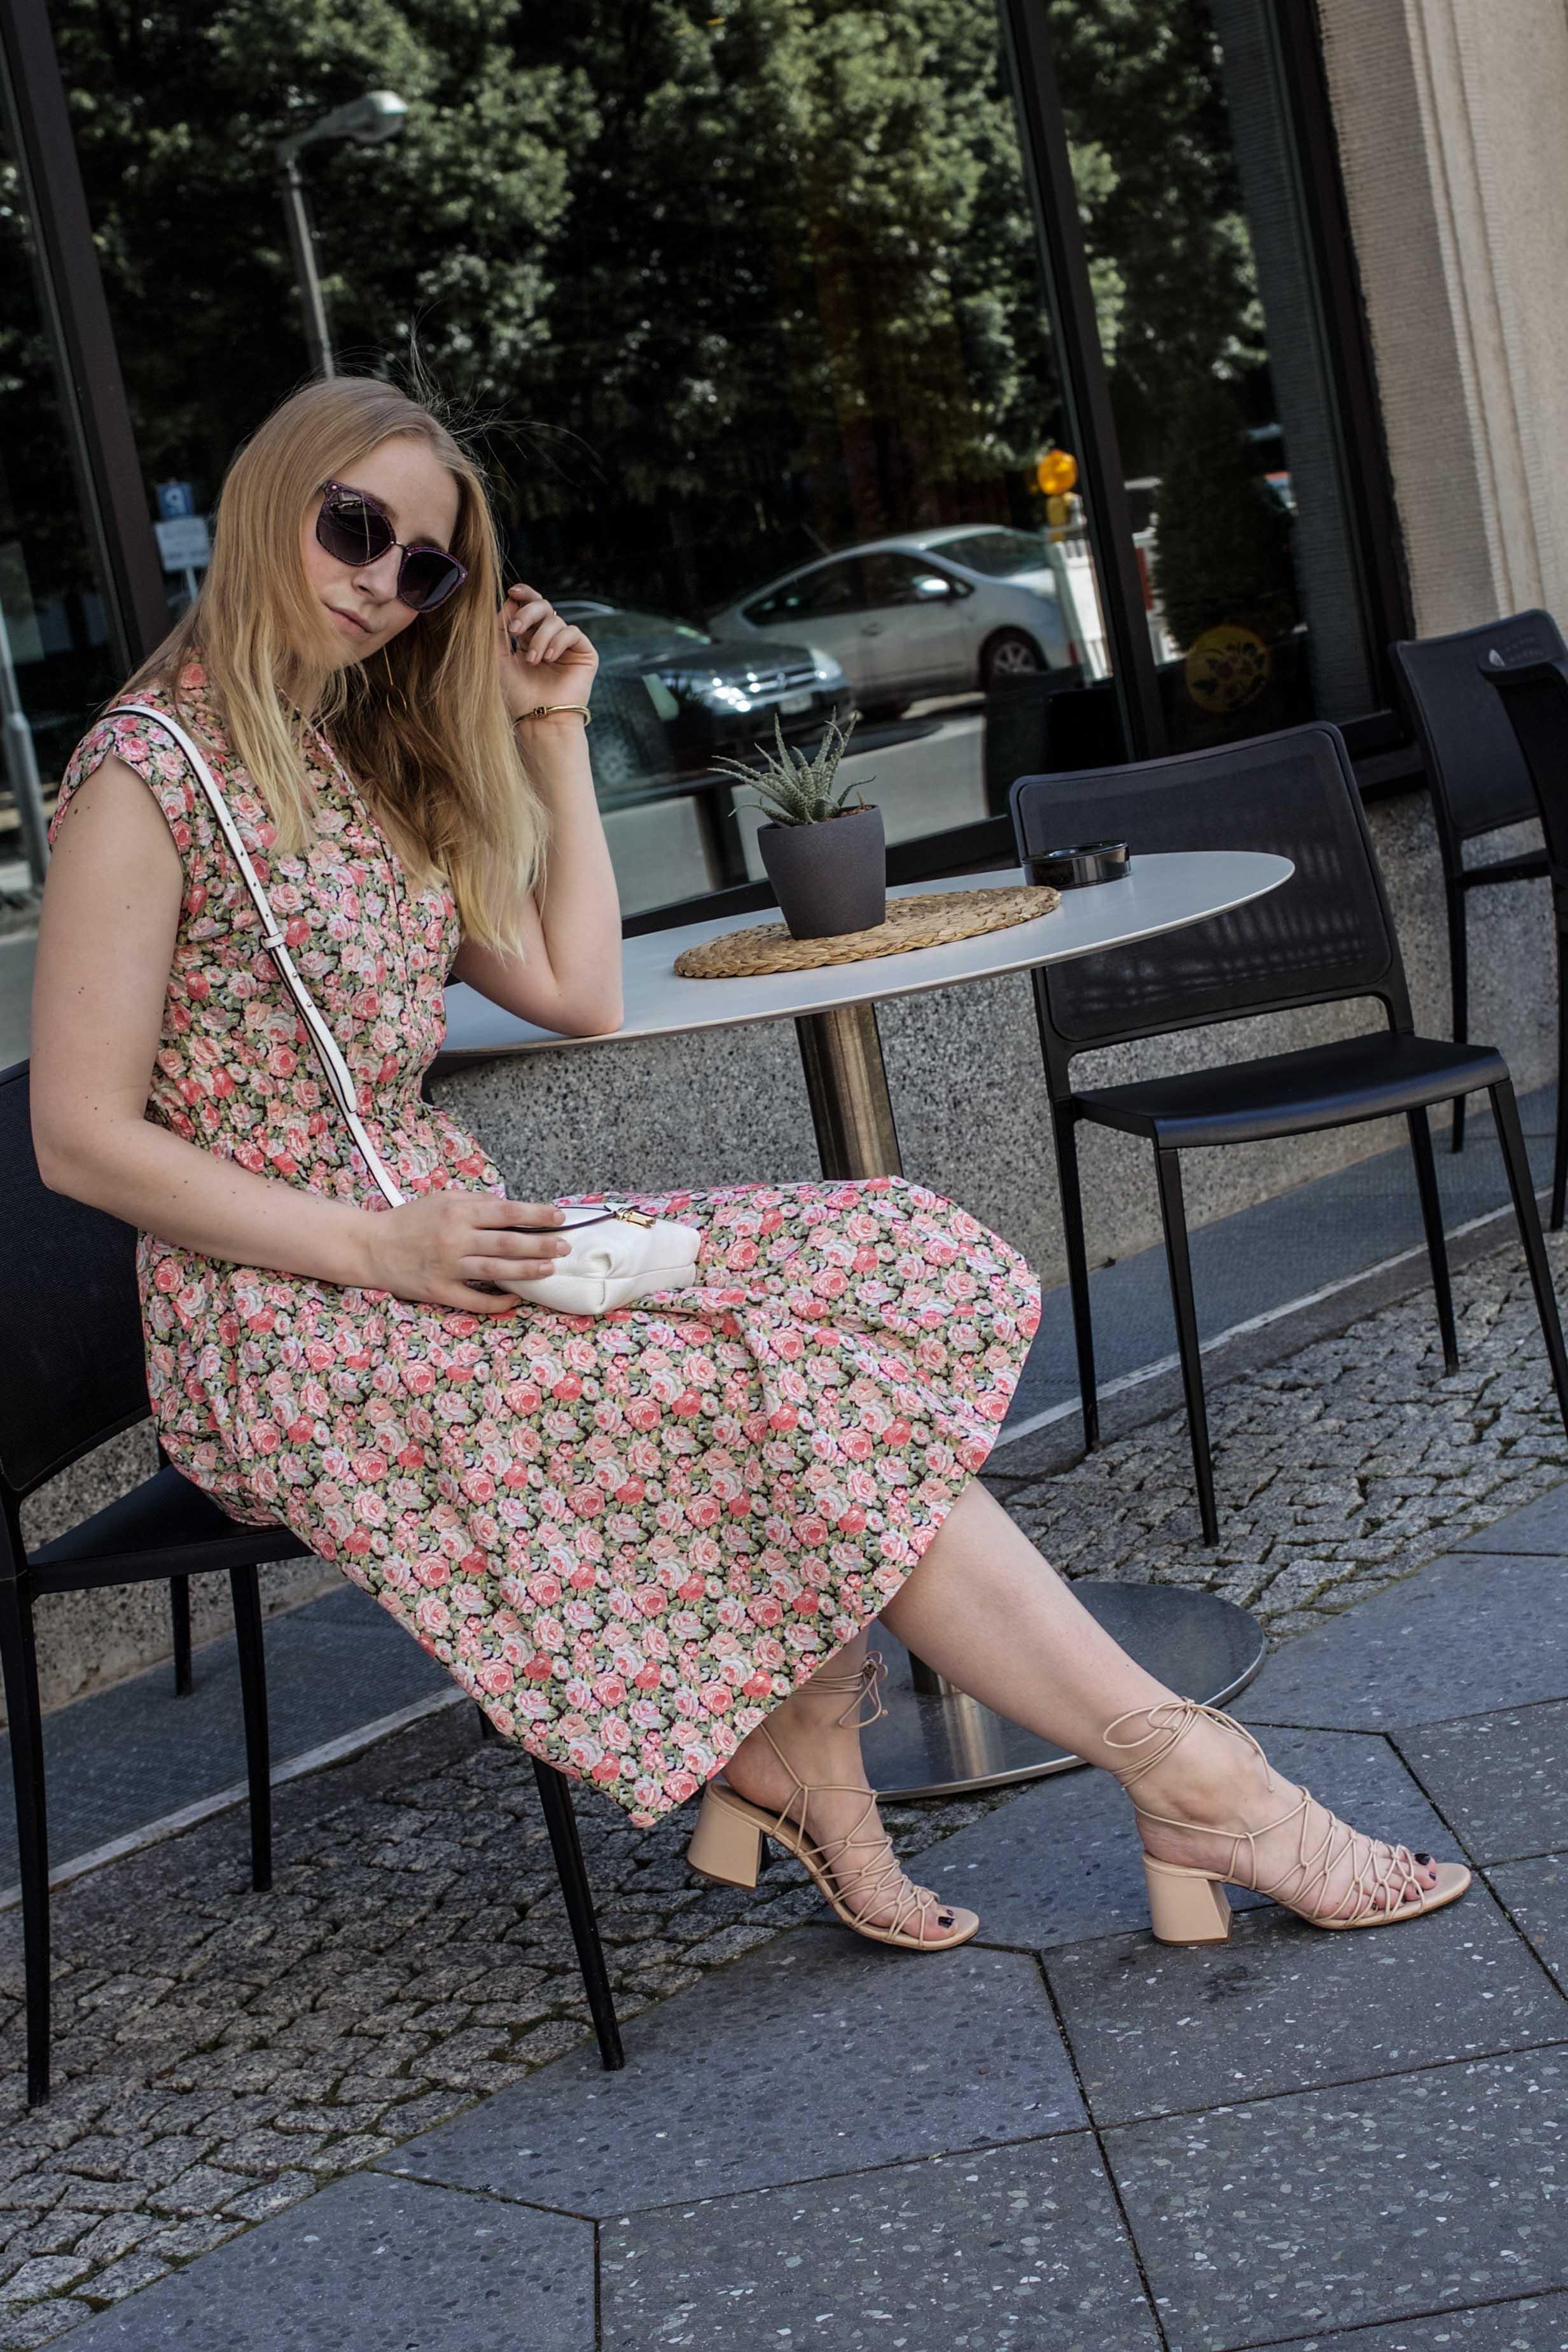 80er-jahre-blumenkleid-paris-vintage-lover-second-hand-outfit-look-fashionblogger-modeblog_7680